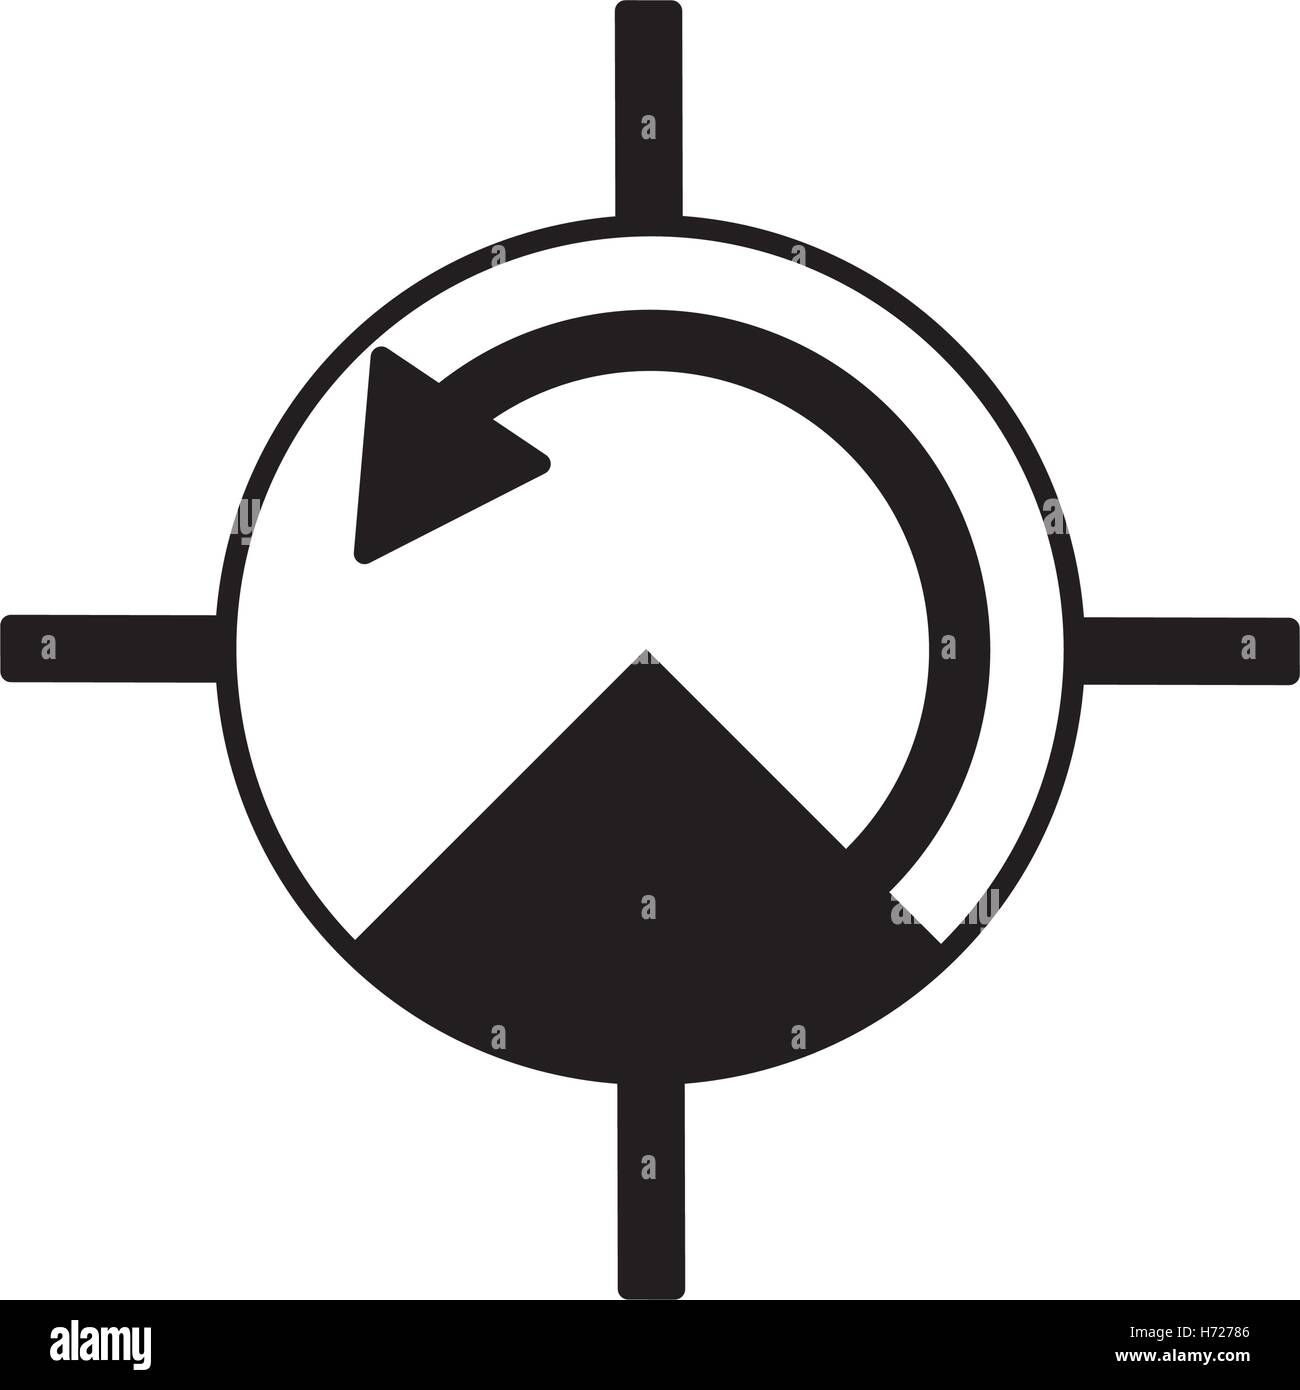 pressure gauge isolated icon vector illustration design - Stock Vector